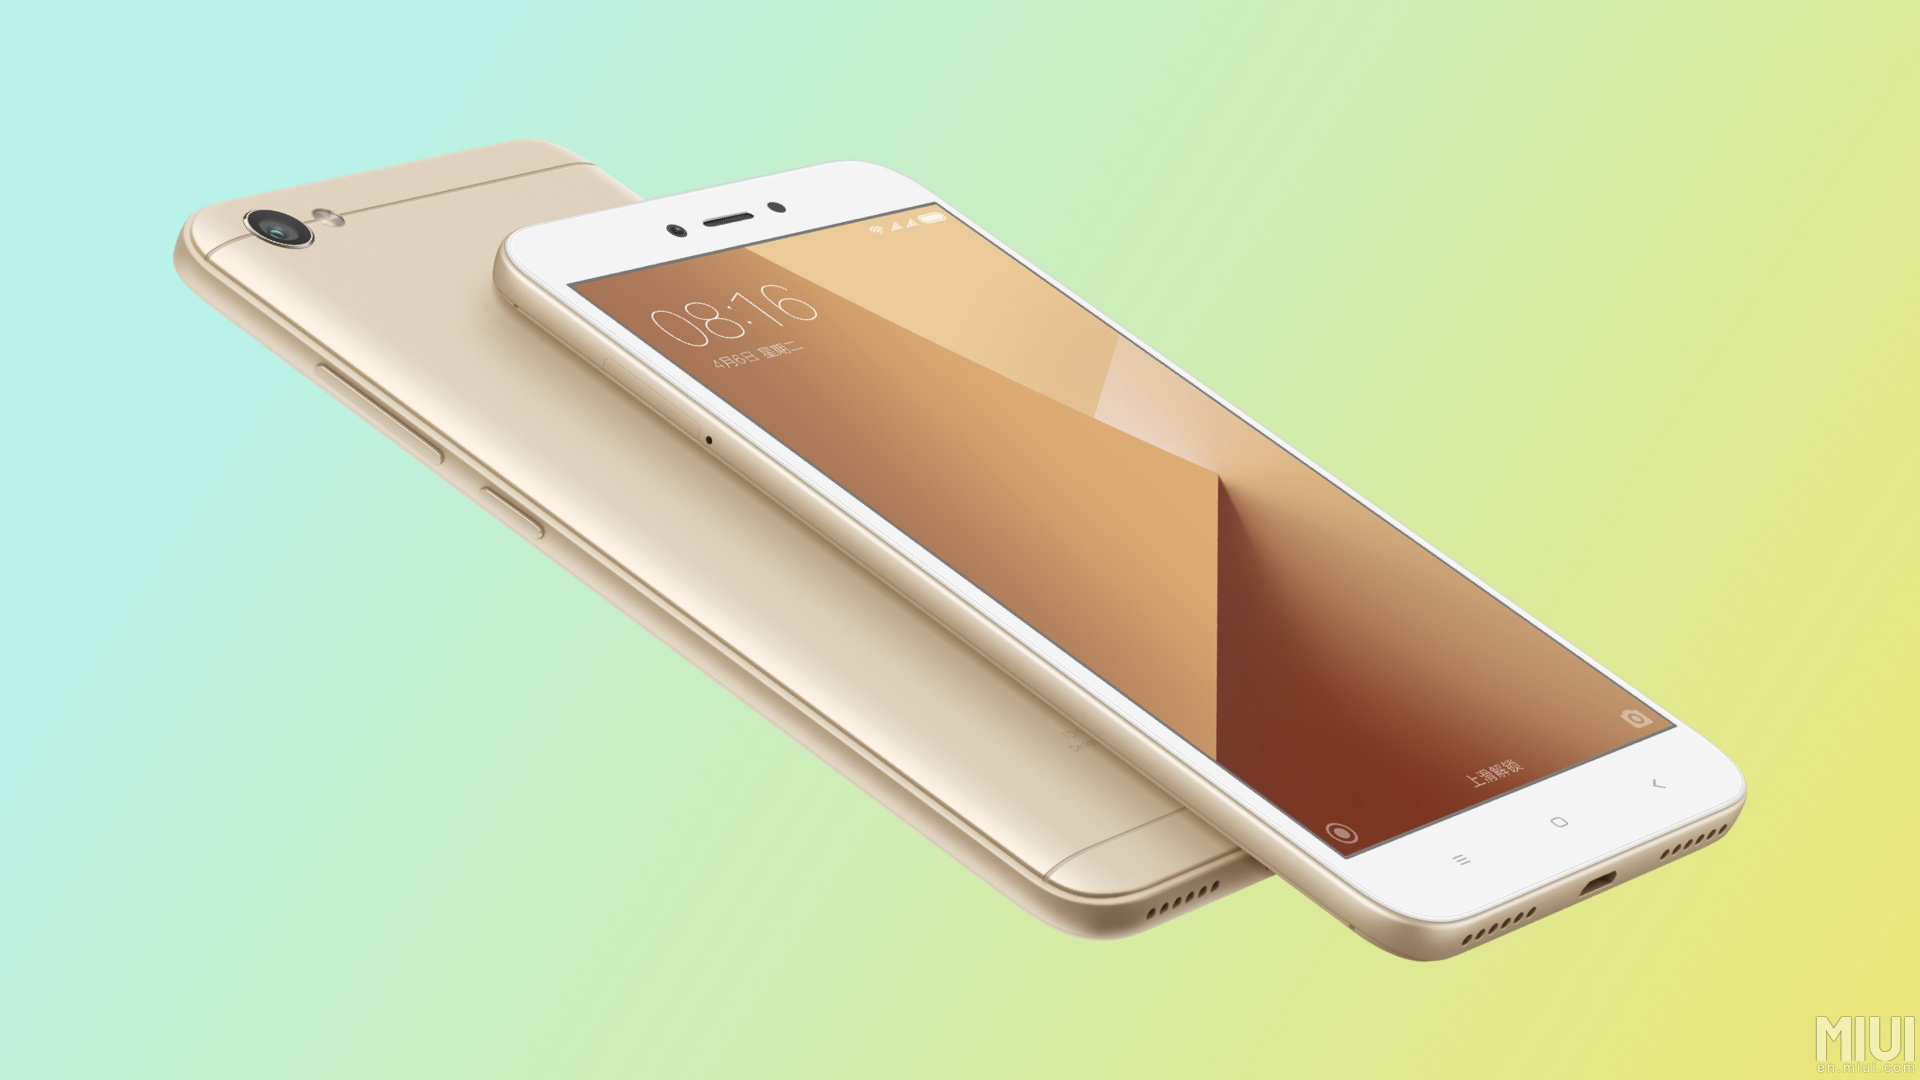 Xiaomi Redmi 5 Plus Und Redmi Note 5a Bis Heute Abend Vergunstigt